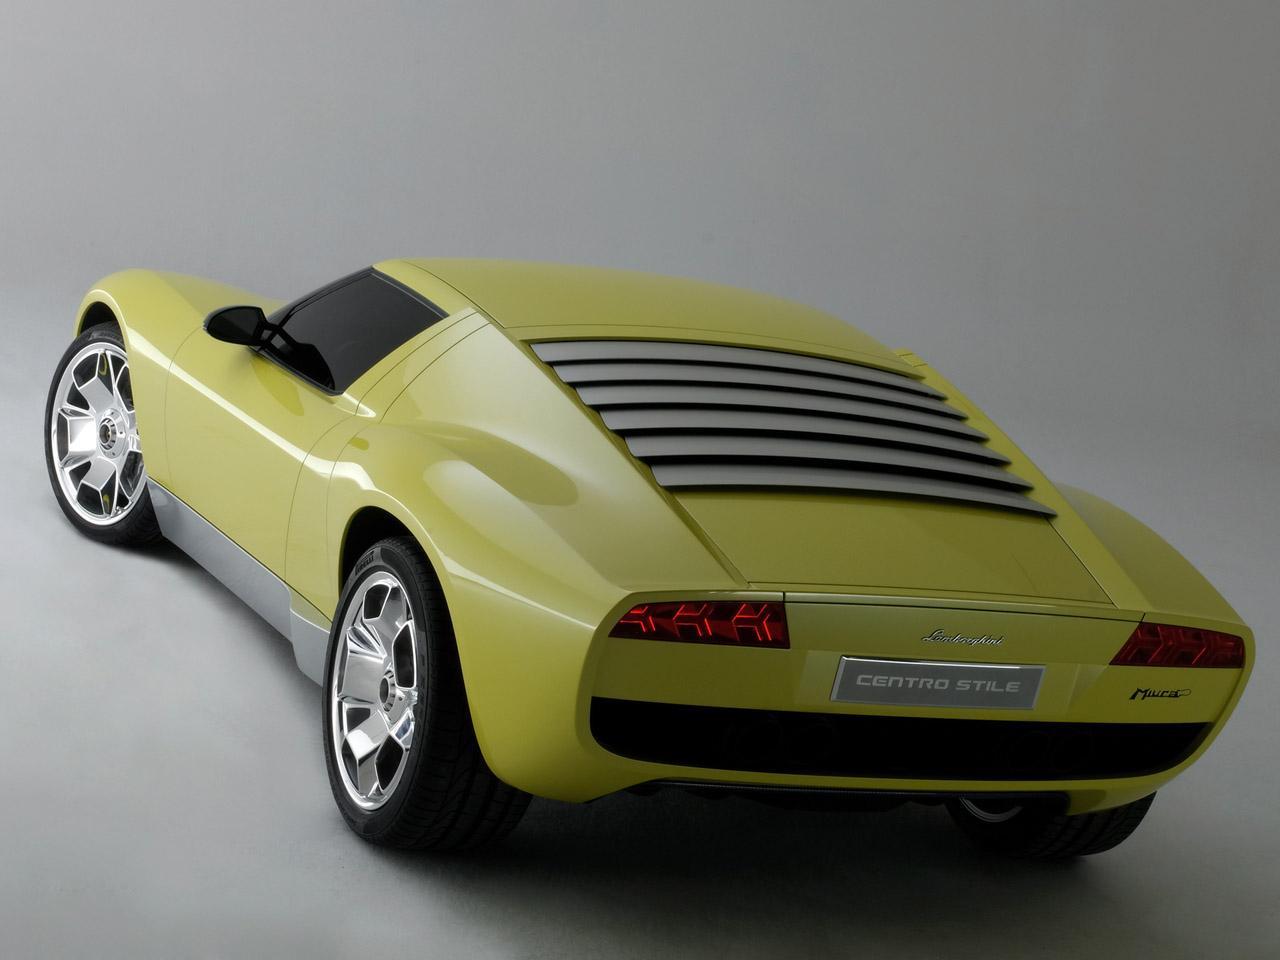 Lamborghini Miura Cool Car Wallpapers